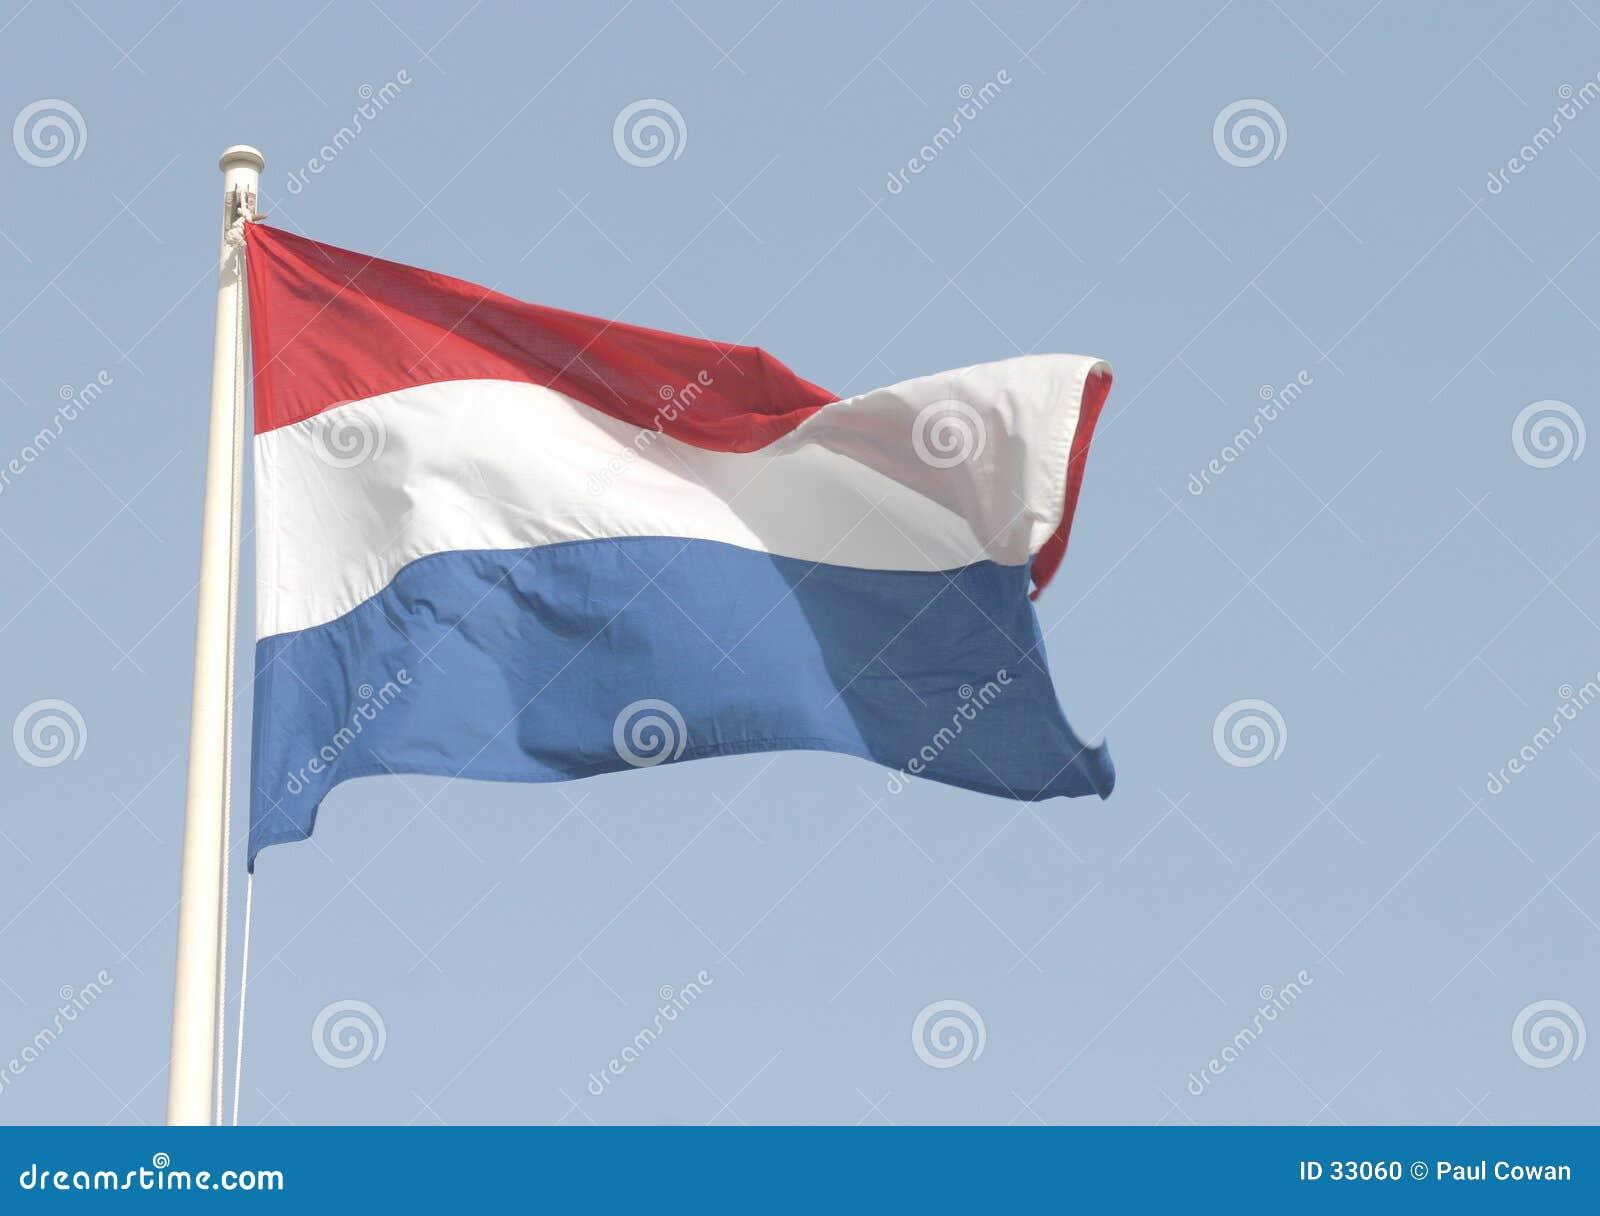 Download Indicador holandés foto de archivo. Imagen de holandés, unión - 33060